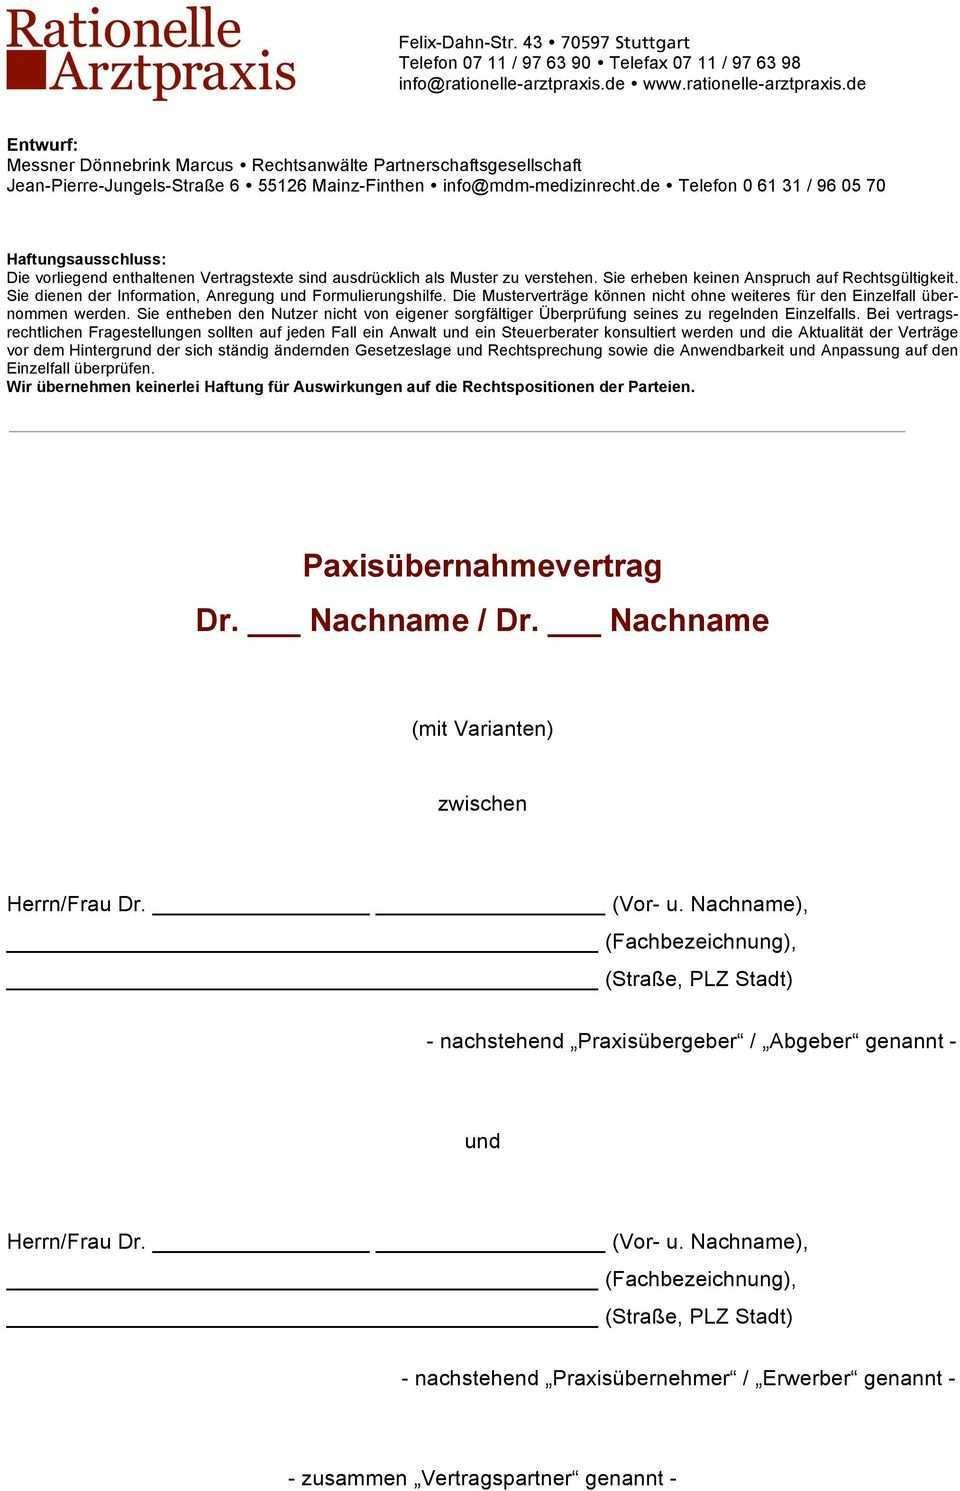 Paxisubernahmevertrag Dr Nachname Dr Nachname Pdf Kostenfreier Download